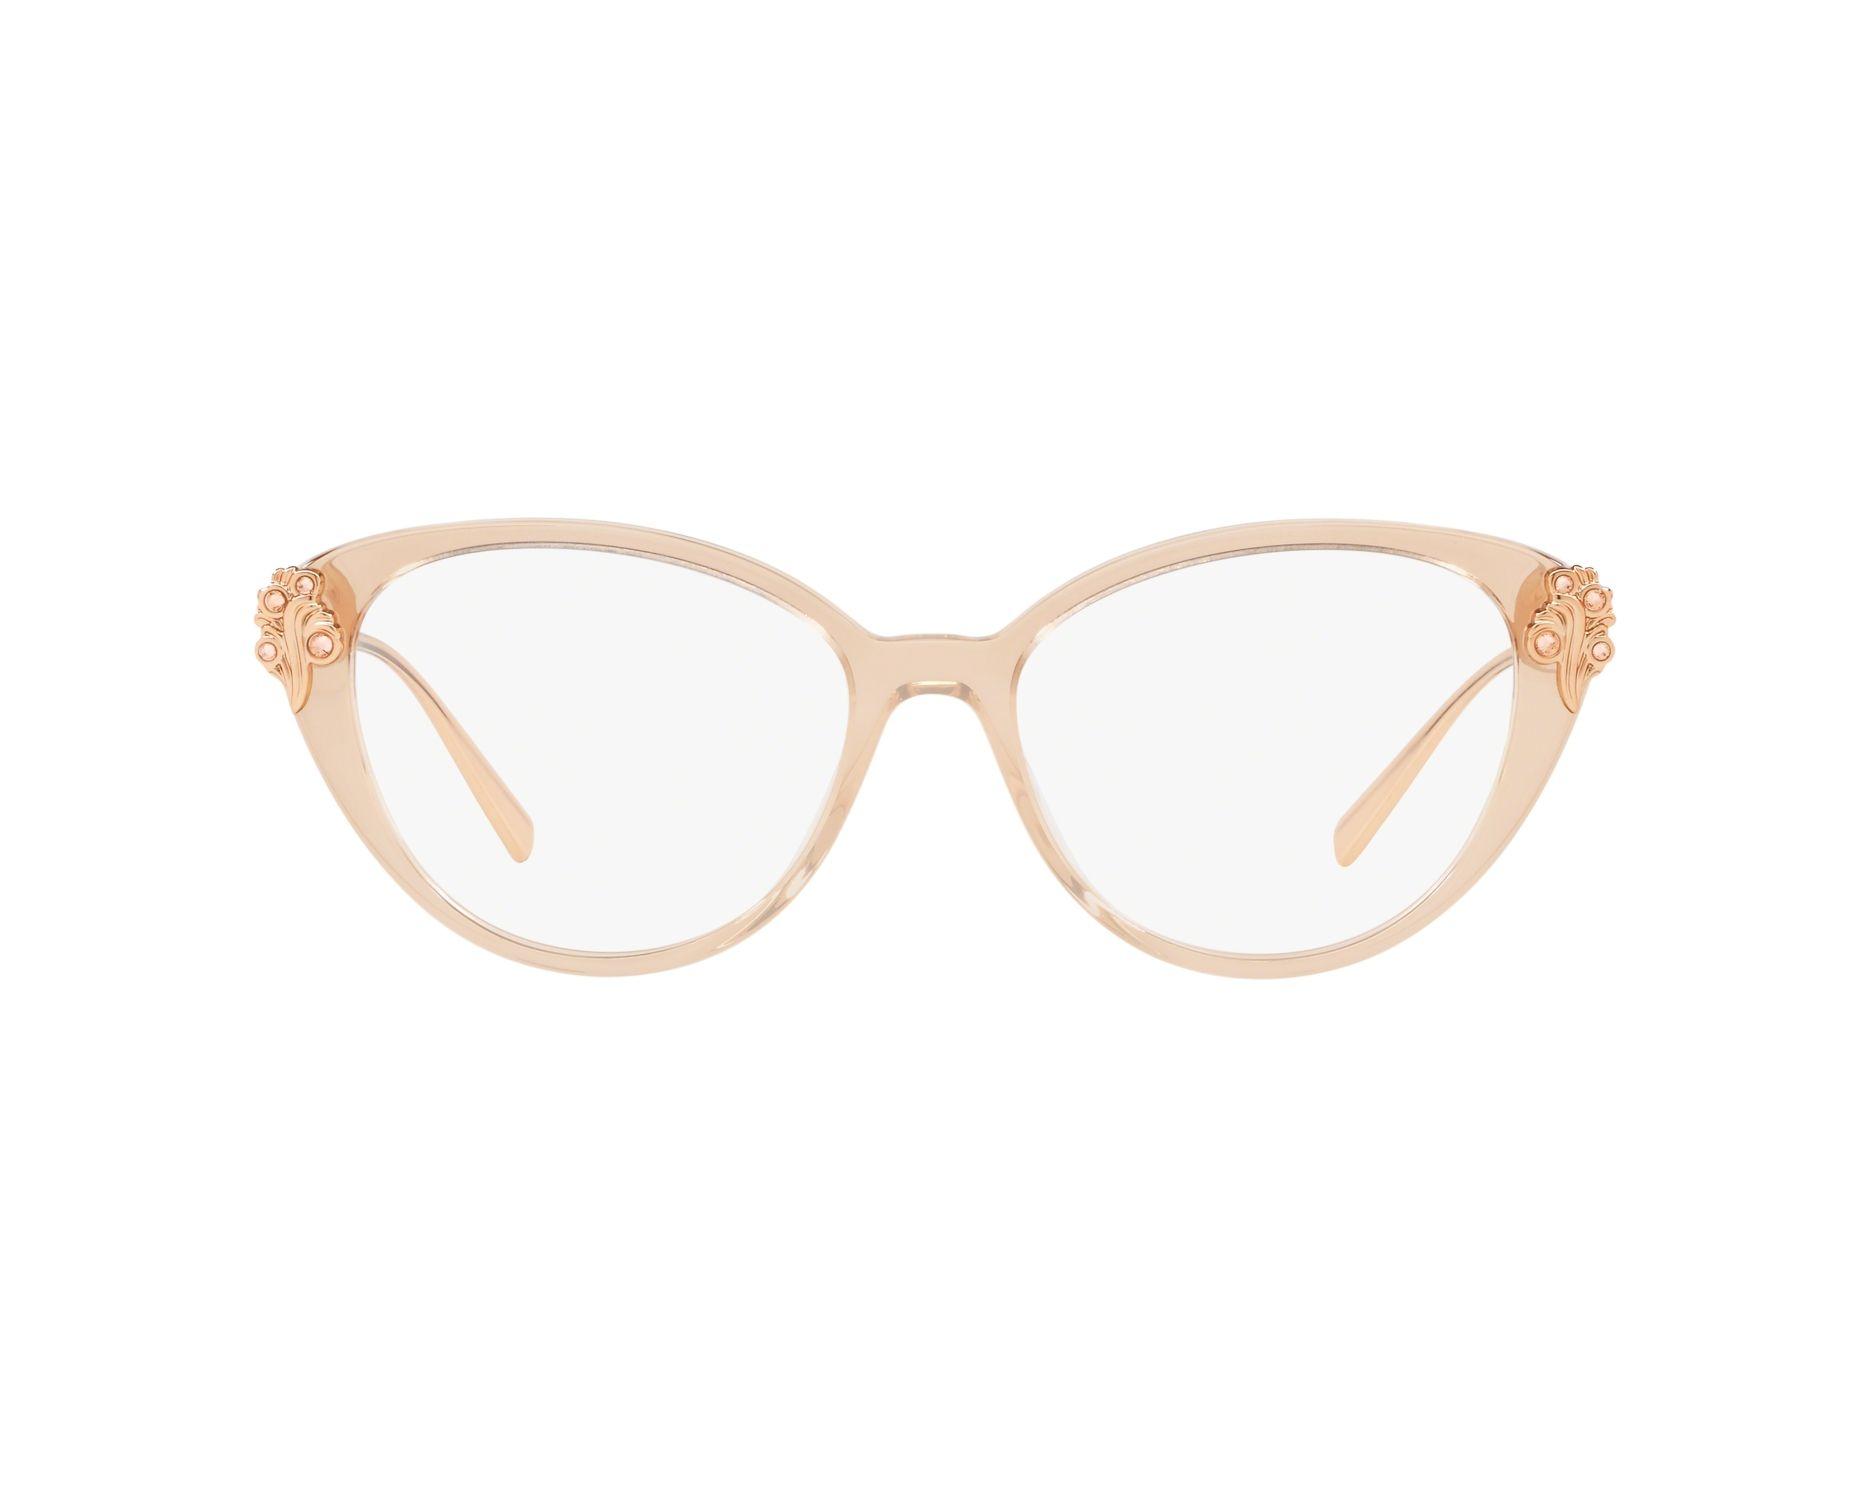 0d498fa06d78 eyeglasses Versace VE-3262-B 5215 - Rosa Gold Copper 360 degree view 1